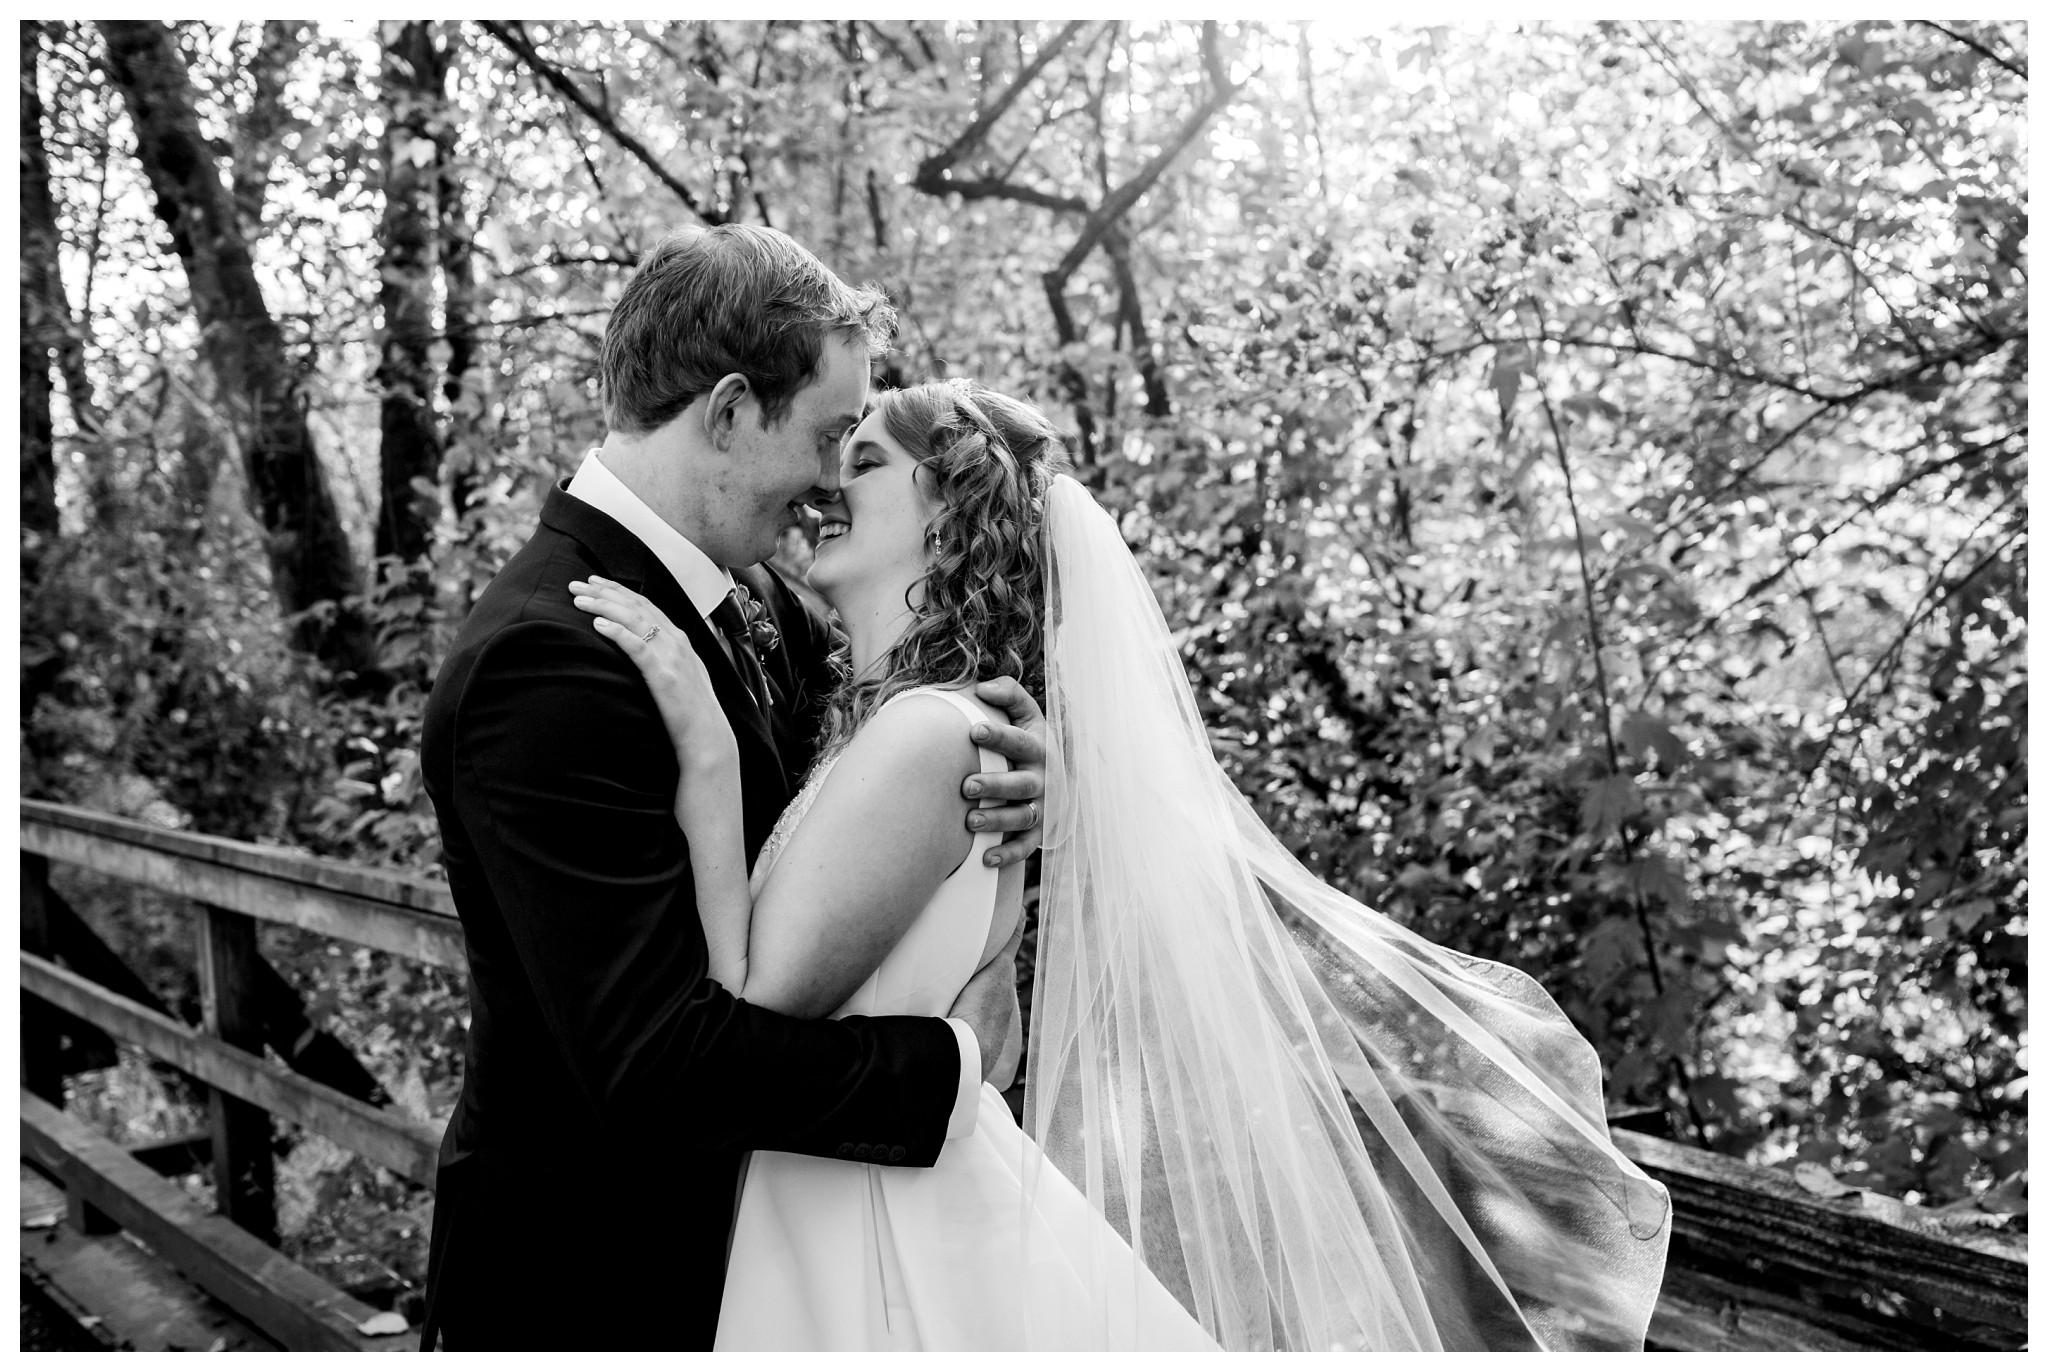 Aldergrove Park Christian Church Wedding Photography Pink Flowers Blue Bridesmaid Dress Fall_0102.jpg